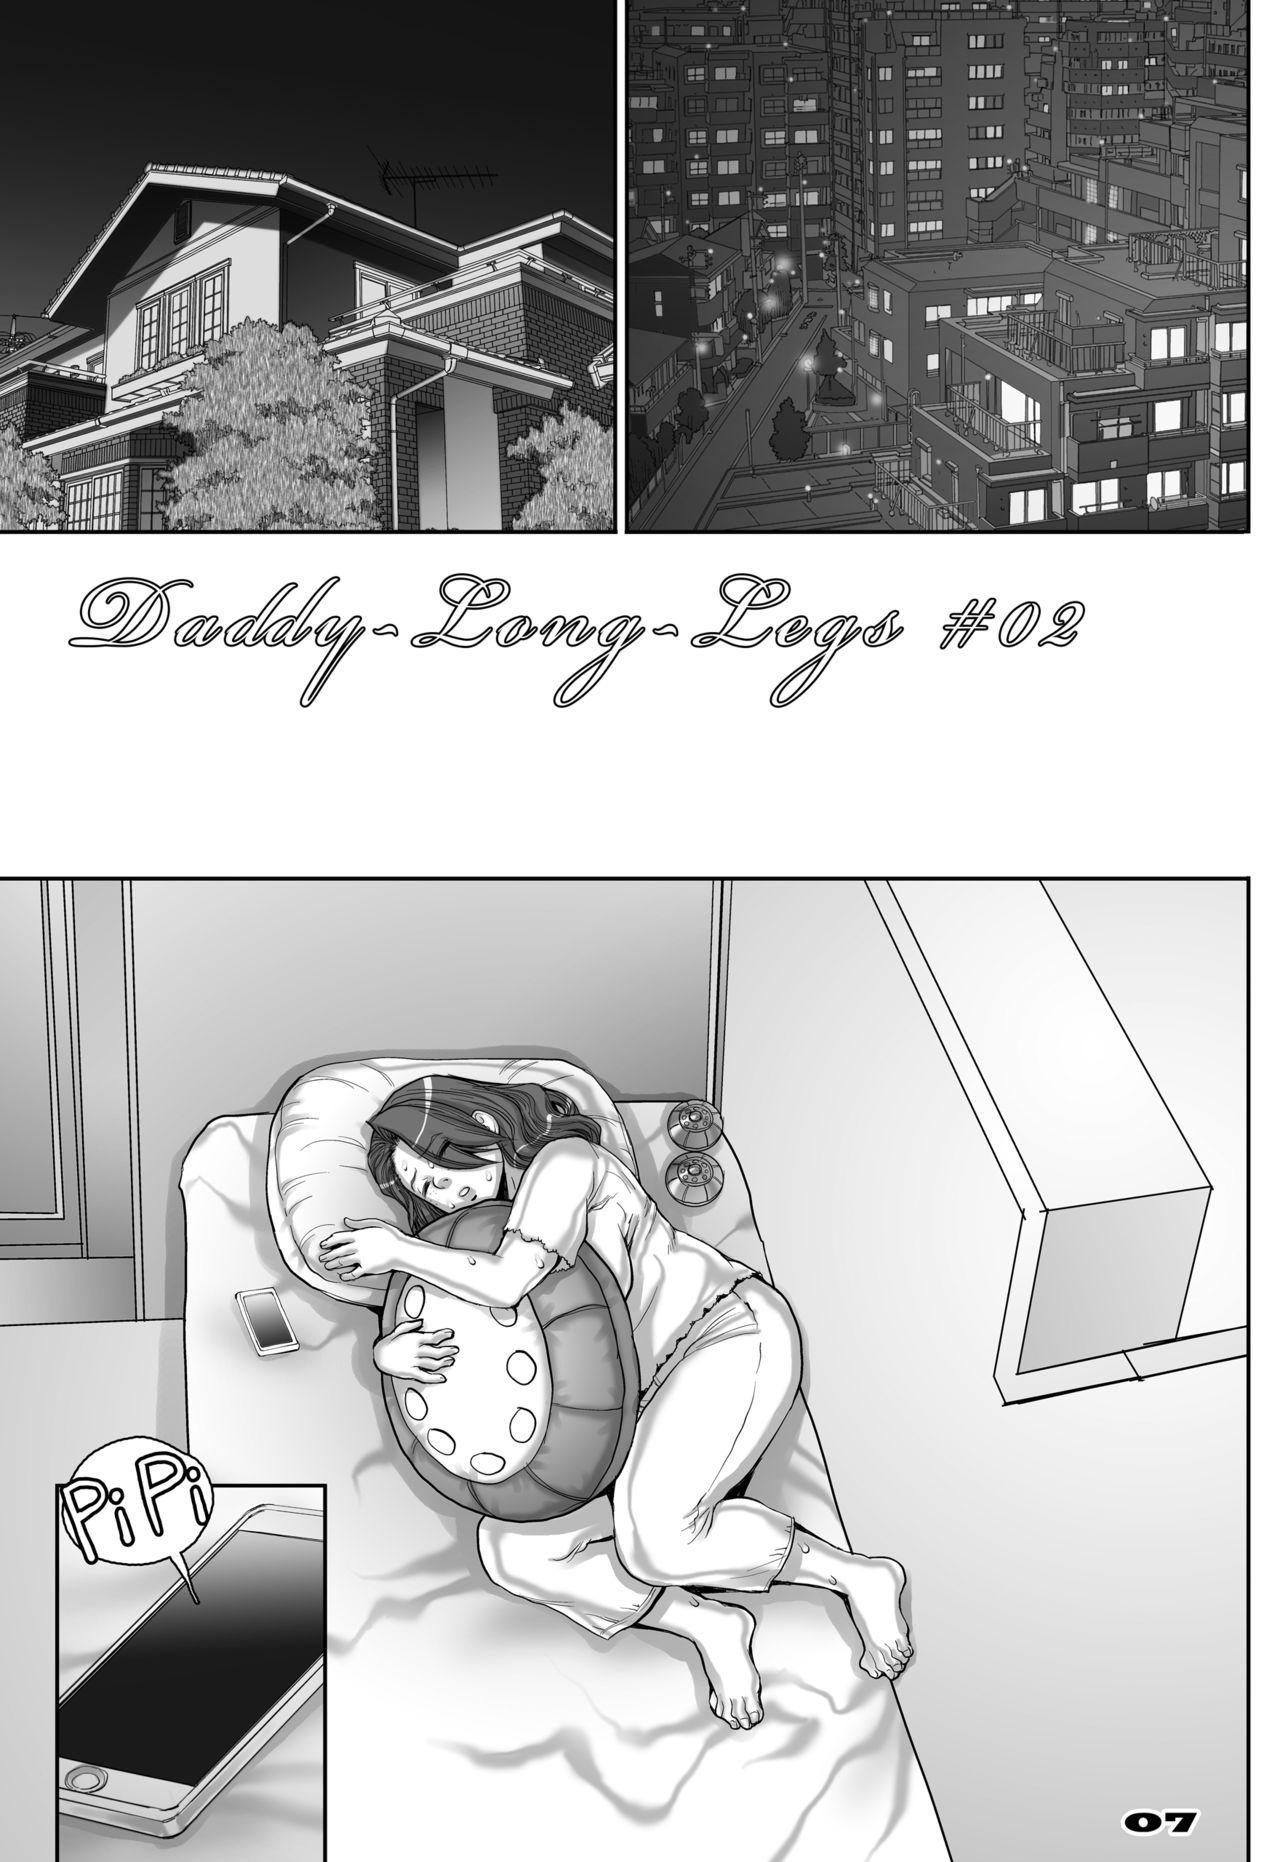 [Studio Tapa Tapa (Sengoku-kun)] Daddy-Long-Legs #2 (Gundam Build Fighters Try) [Digital] 6